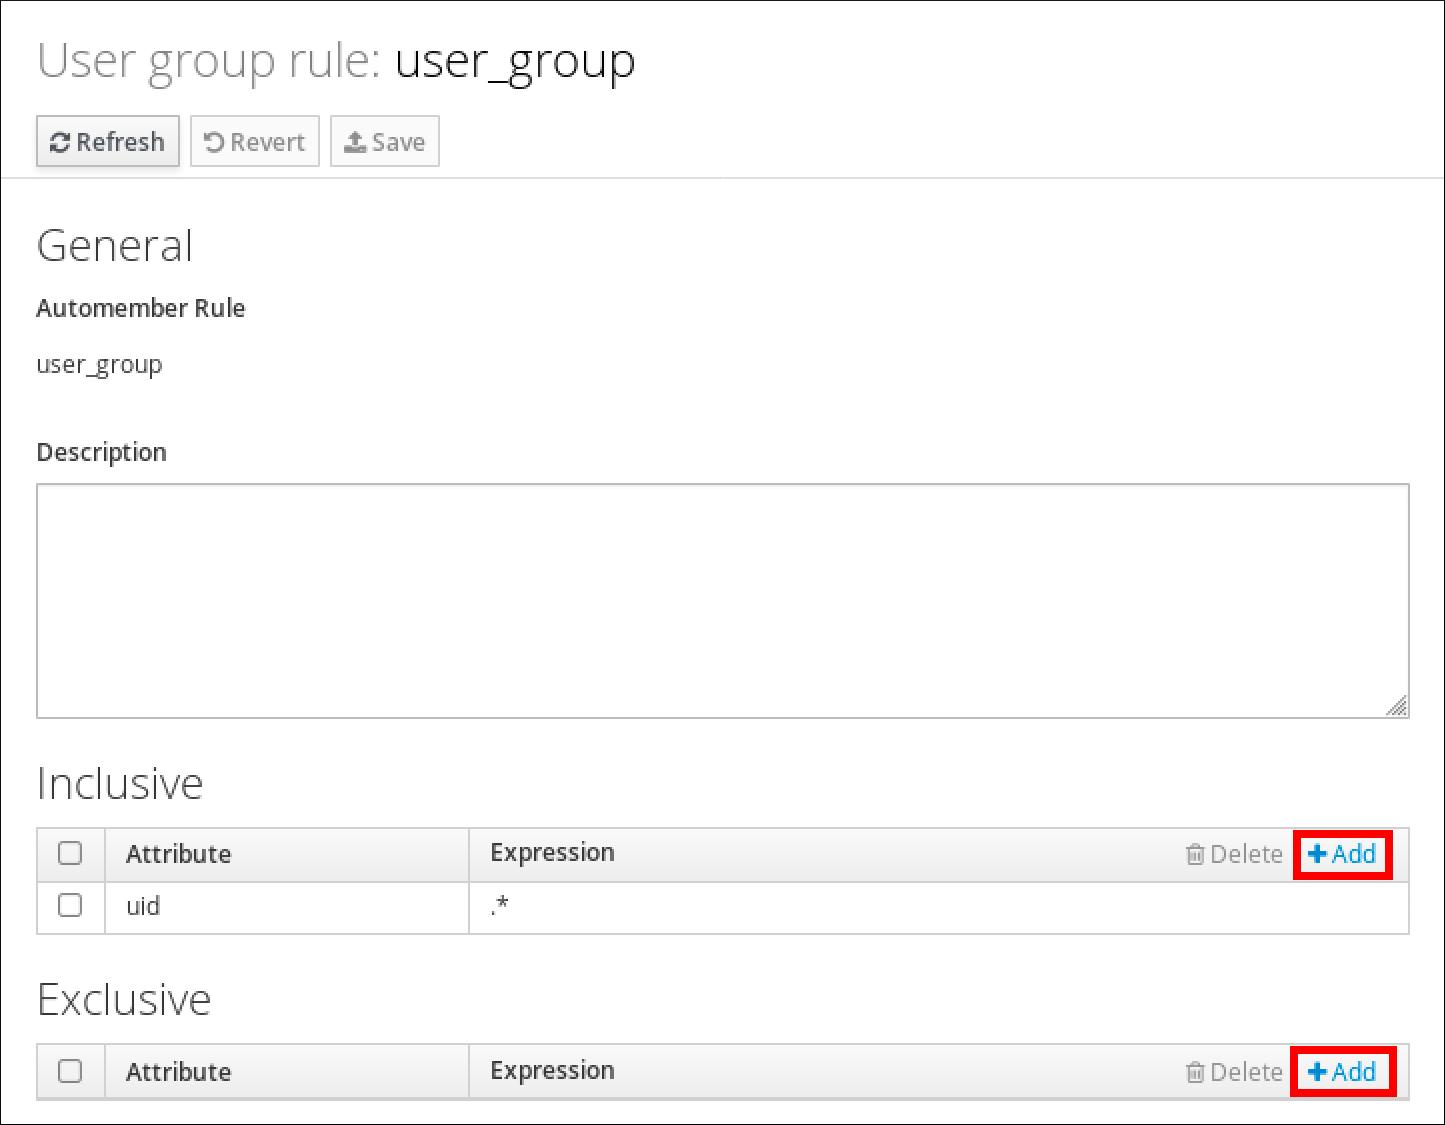 "User group 规则页面的屏幕截图,其中显示了 user_group 规则的属性。""Inclusive""部分有一个带有""Attribute""列的表,以及带有 Attribute ""uid"" 条目的""Expression""列,其表达式为 "".*""。底部是 Exclusive 部分,它也有一个含有 Attribute 列和 Expression 列的表,但它没有条目。"